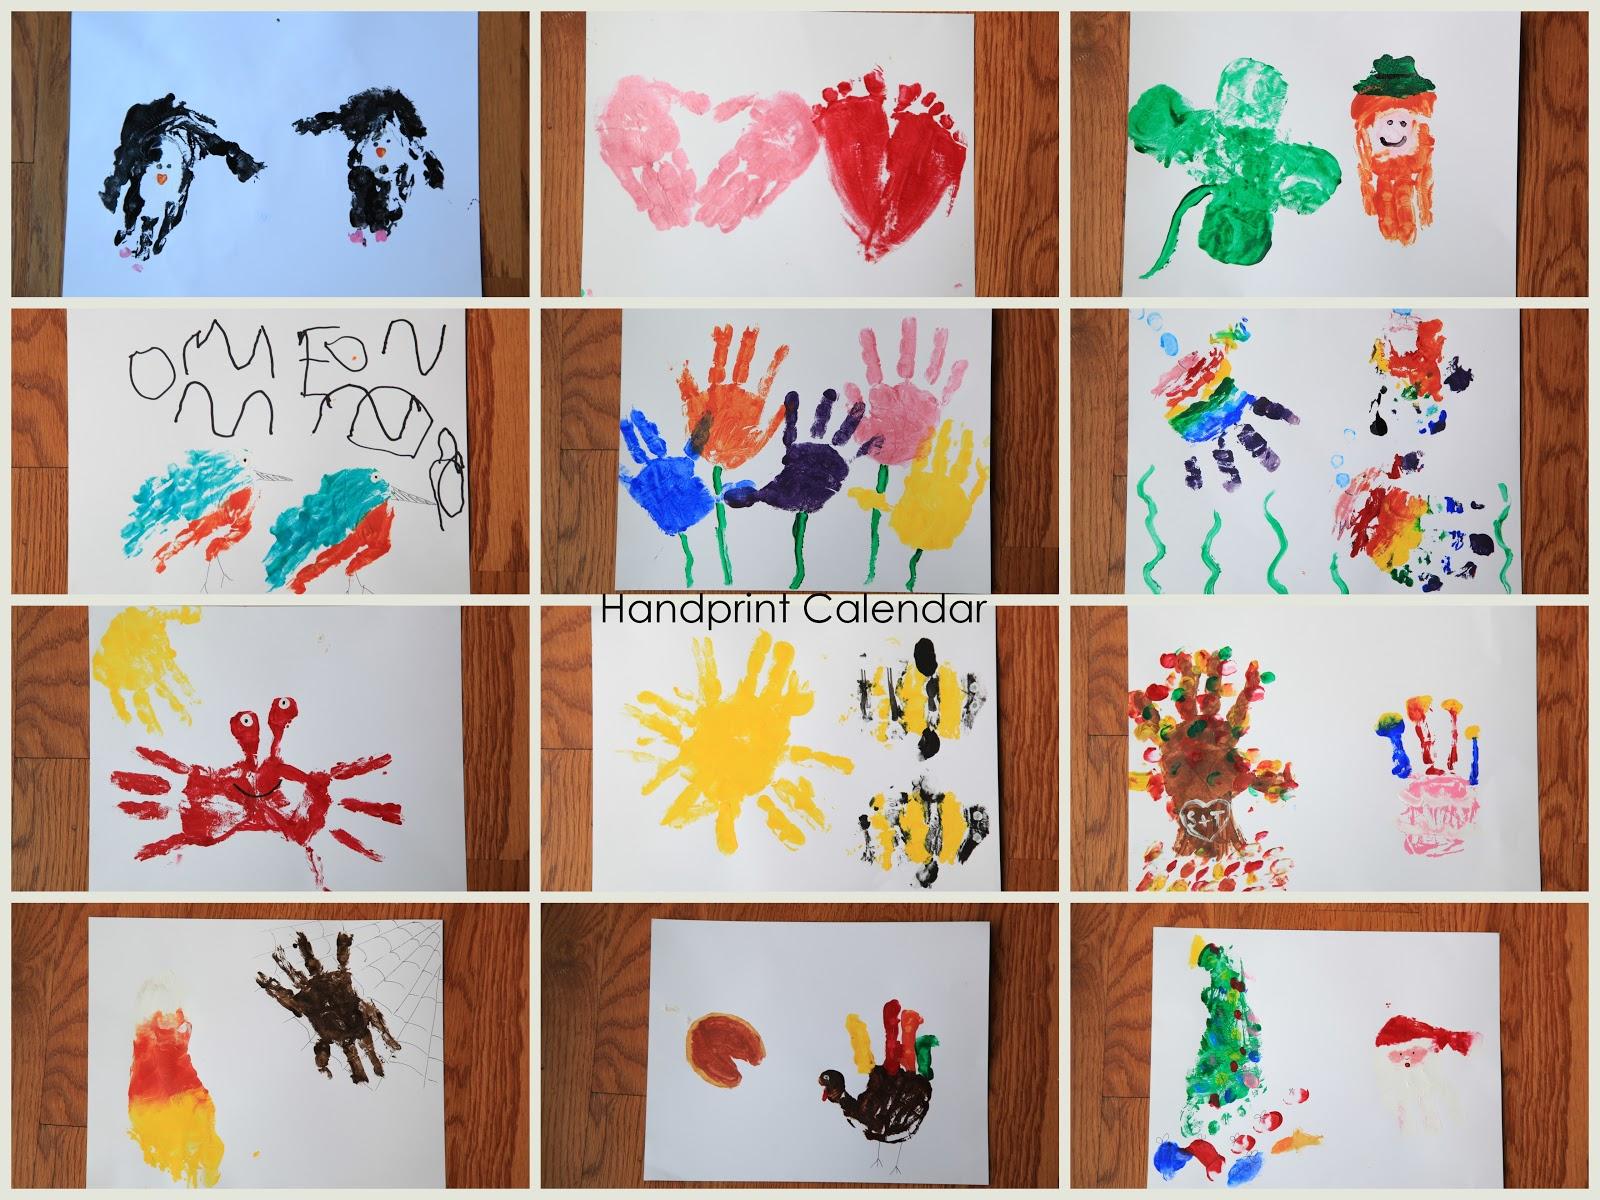 Ks Calendar Ideas To Make : A million things i love handprint calendar